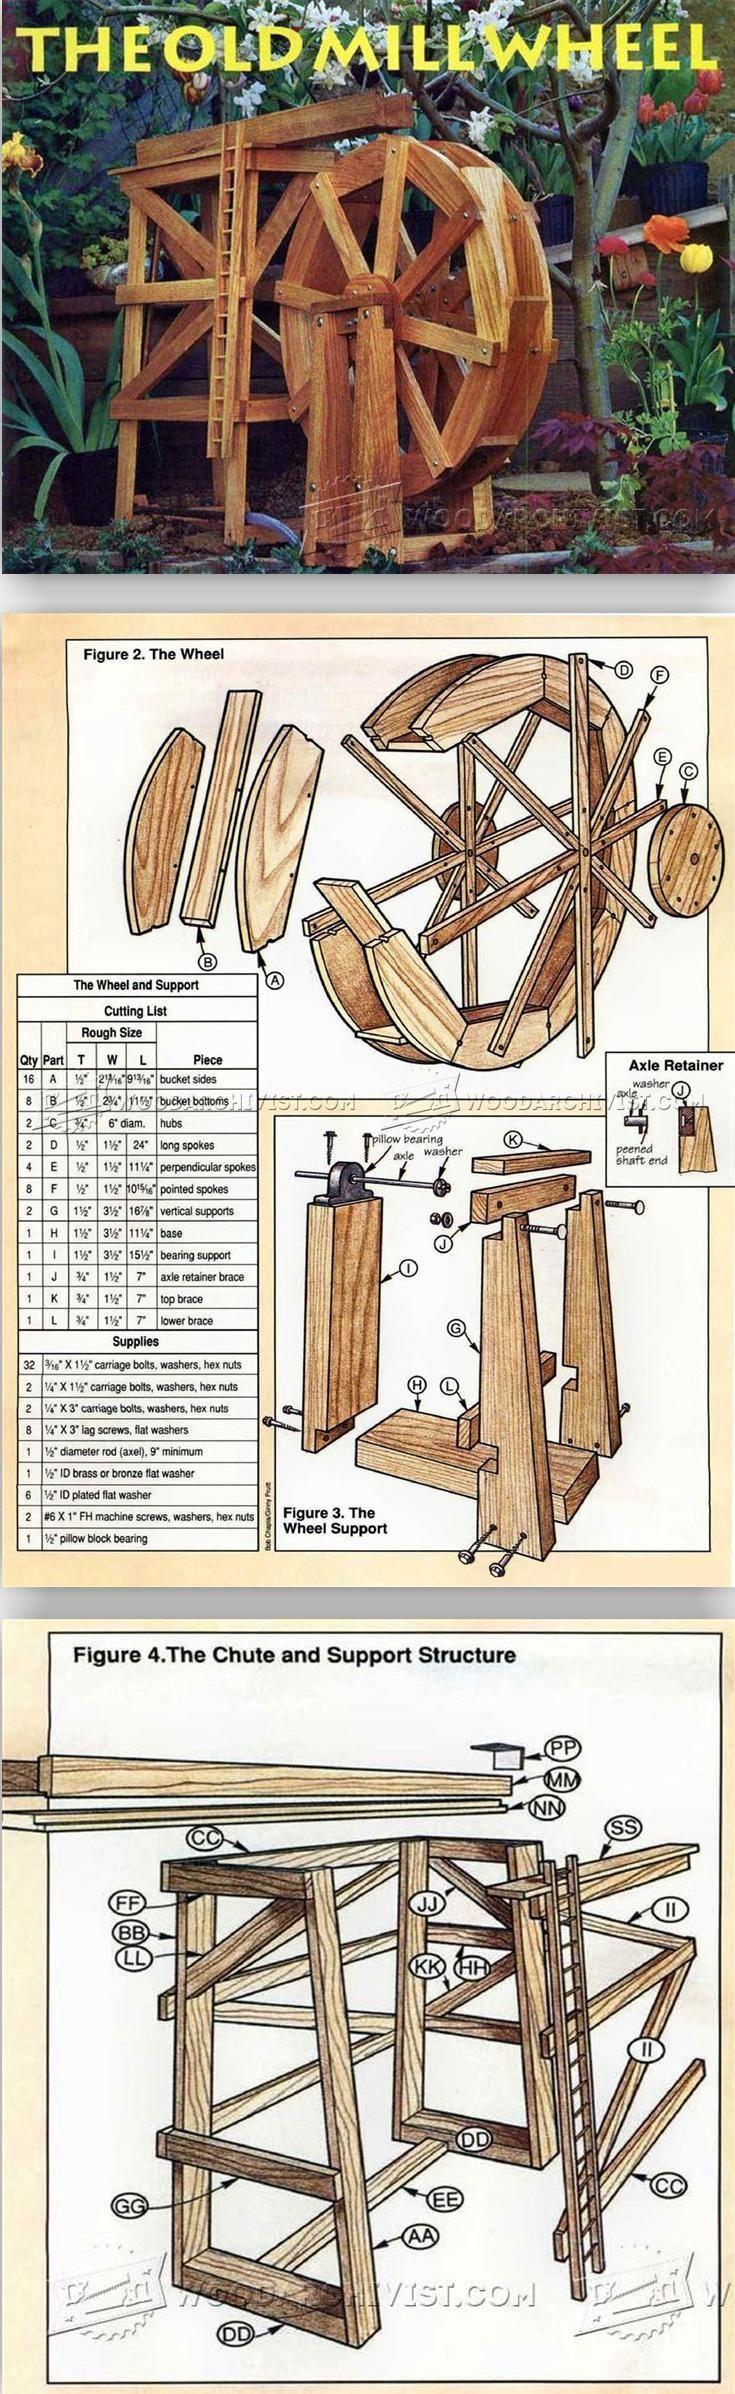 The Old Millwheel Outdoor Plans And Projects Woodarchivist Com Ideias Para Madeira Projetos De Madeira Quintais